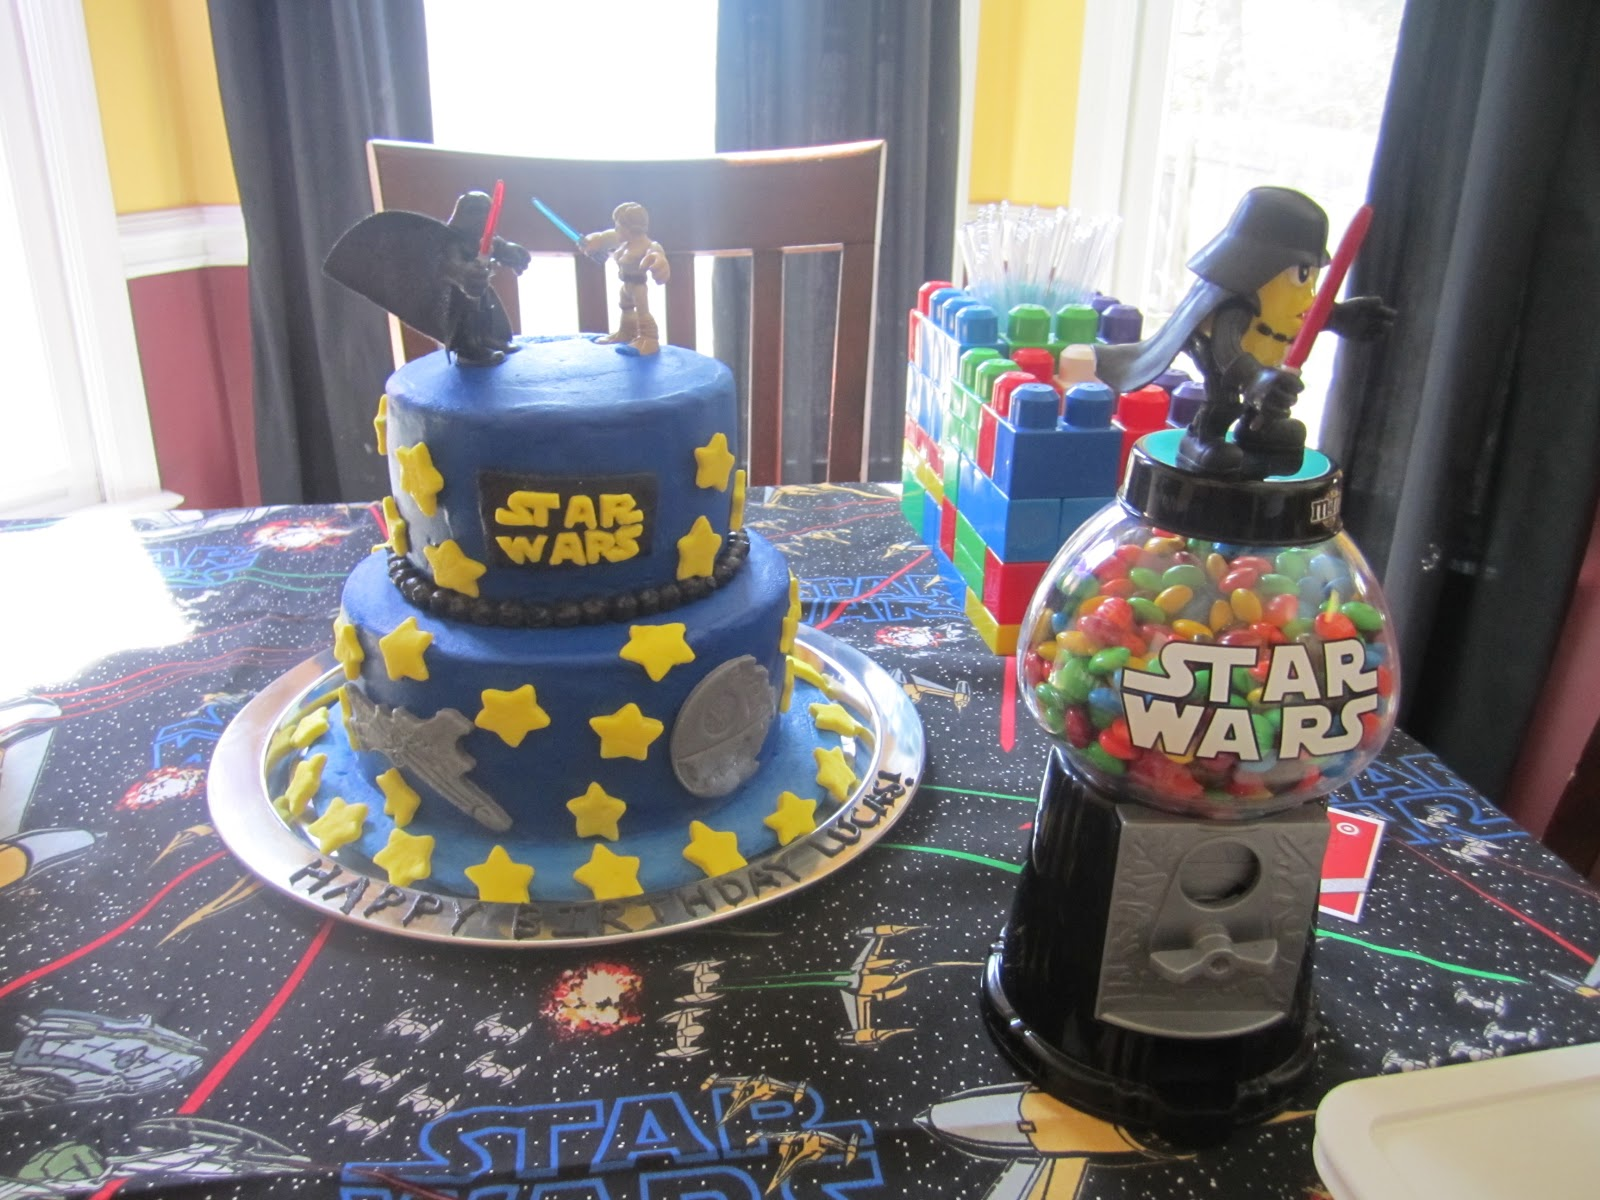 Star Wars Lego Decorations Legos And Baby Dolls Ls Lego Star Wars Birthday Party